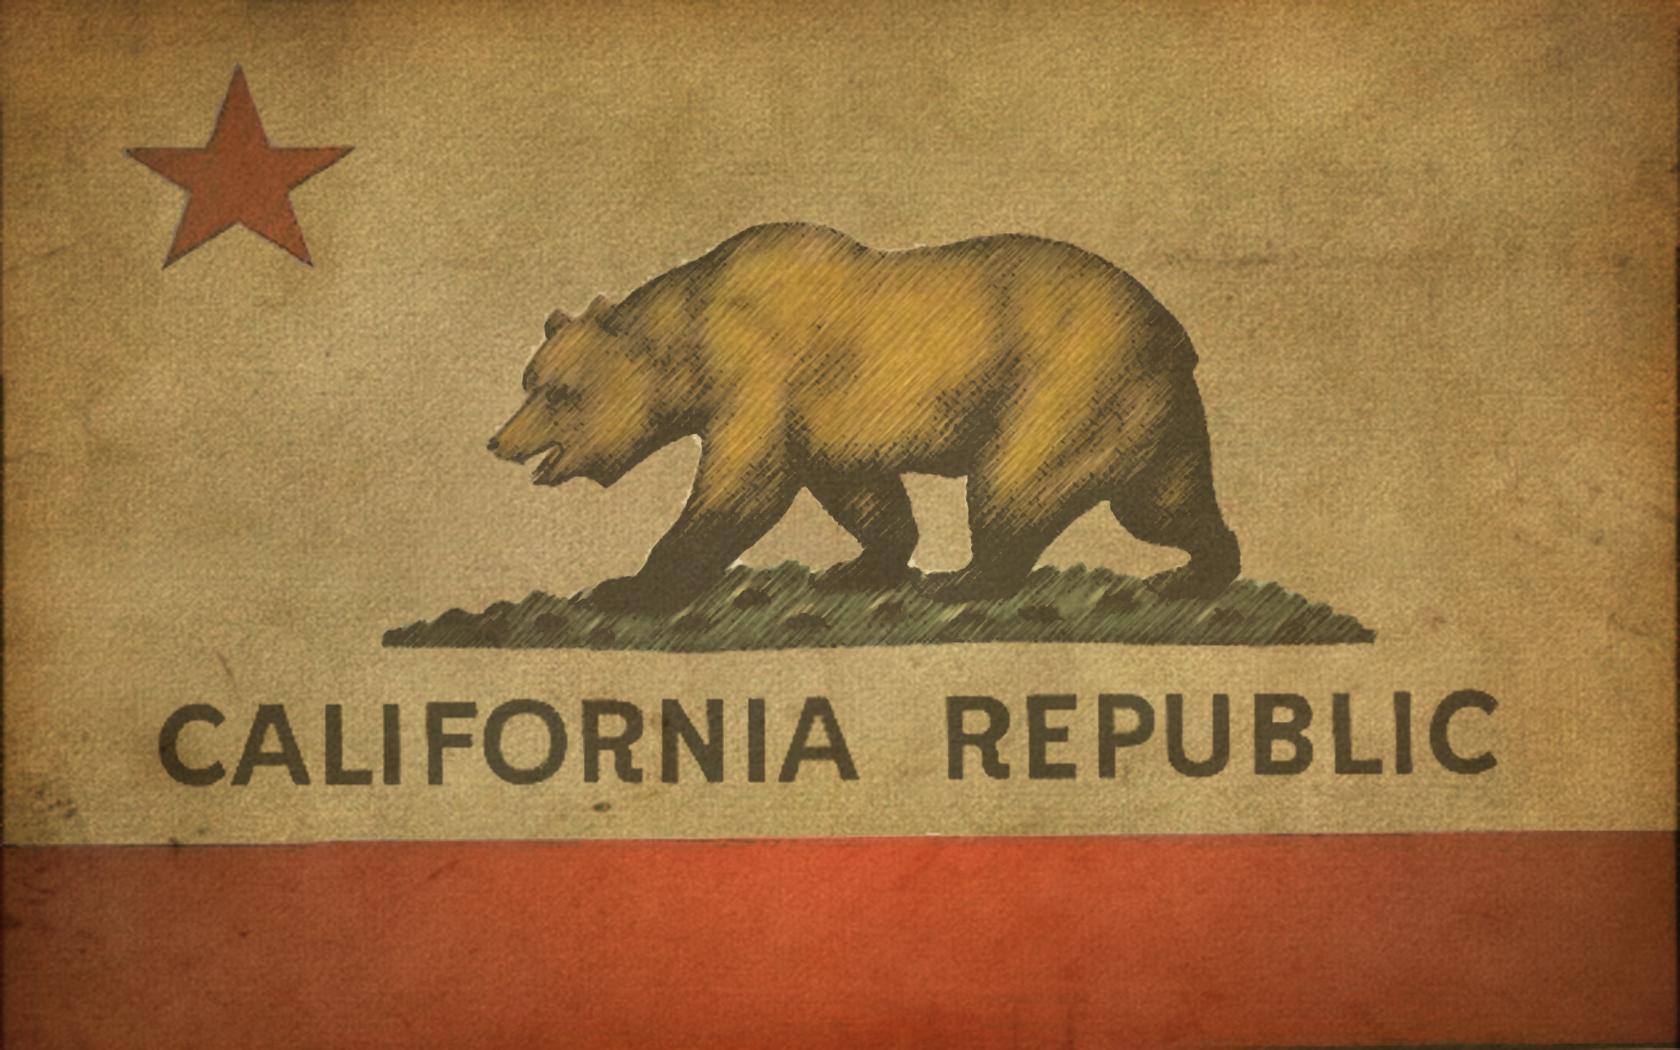 california bears us state flags of bear desktop 1680x1050 hd wallpaper 1680x1050